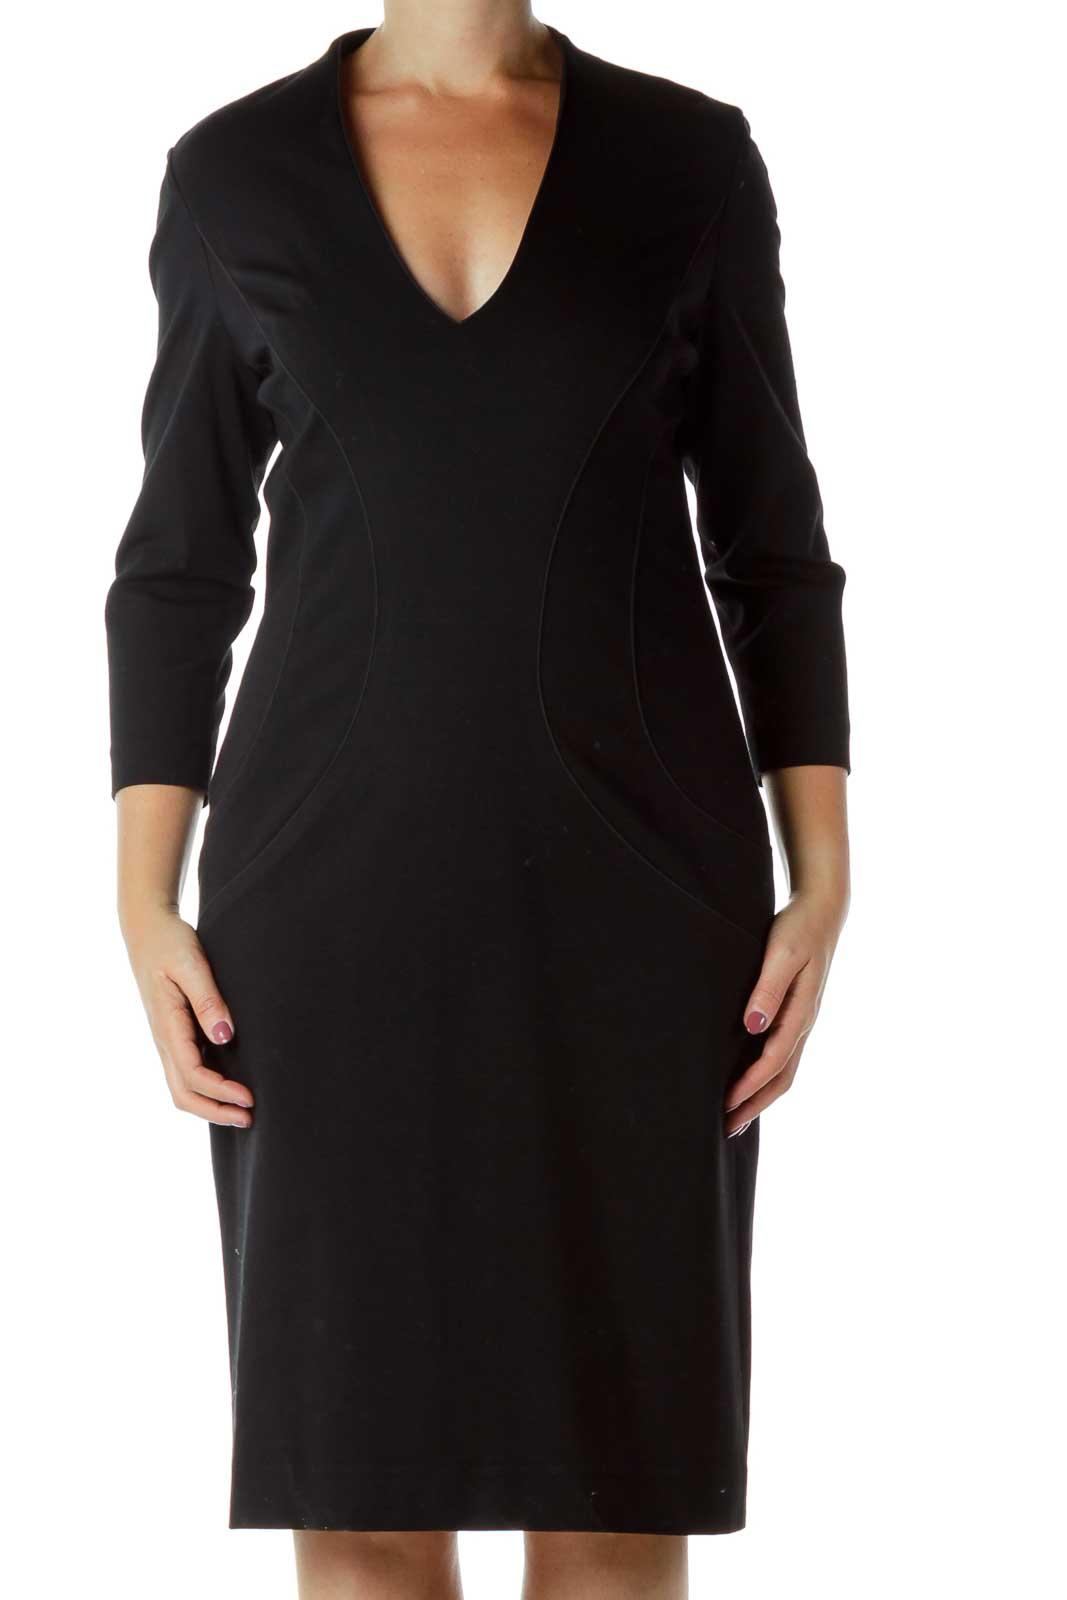 Black V-Neck Midi Dress Front